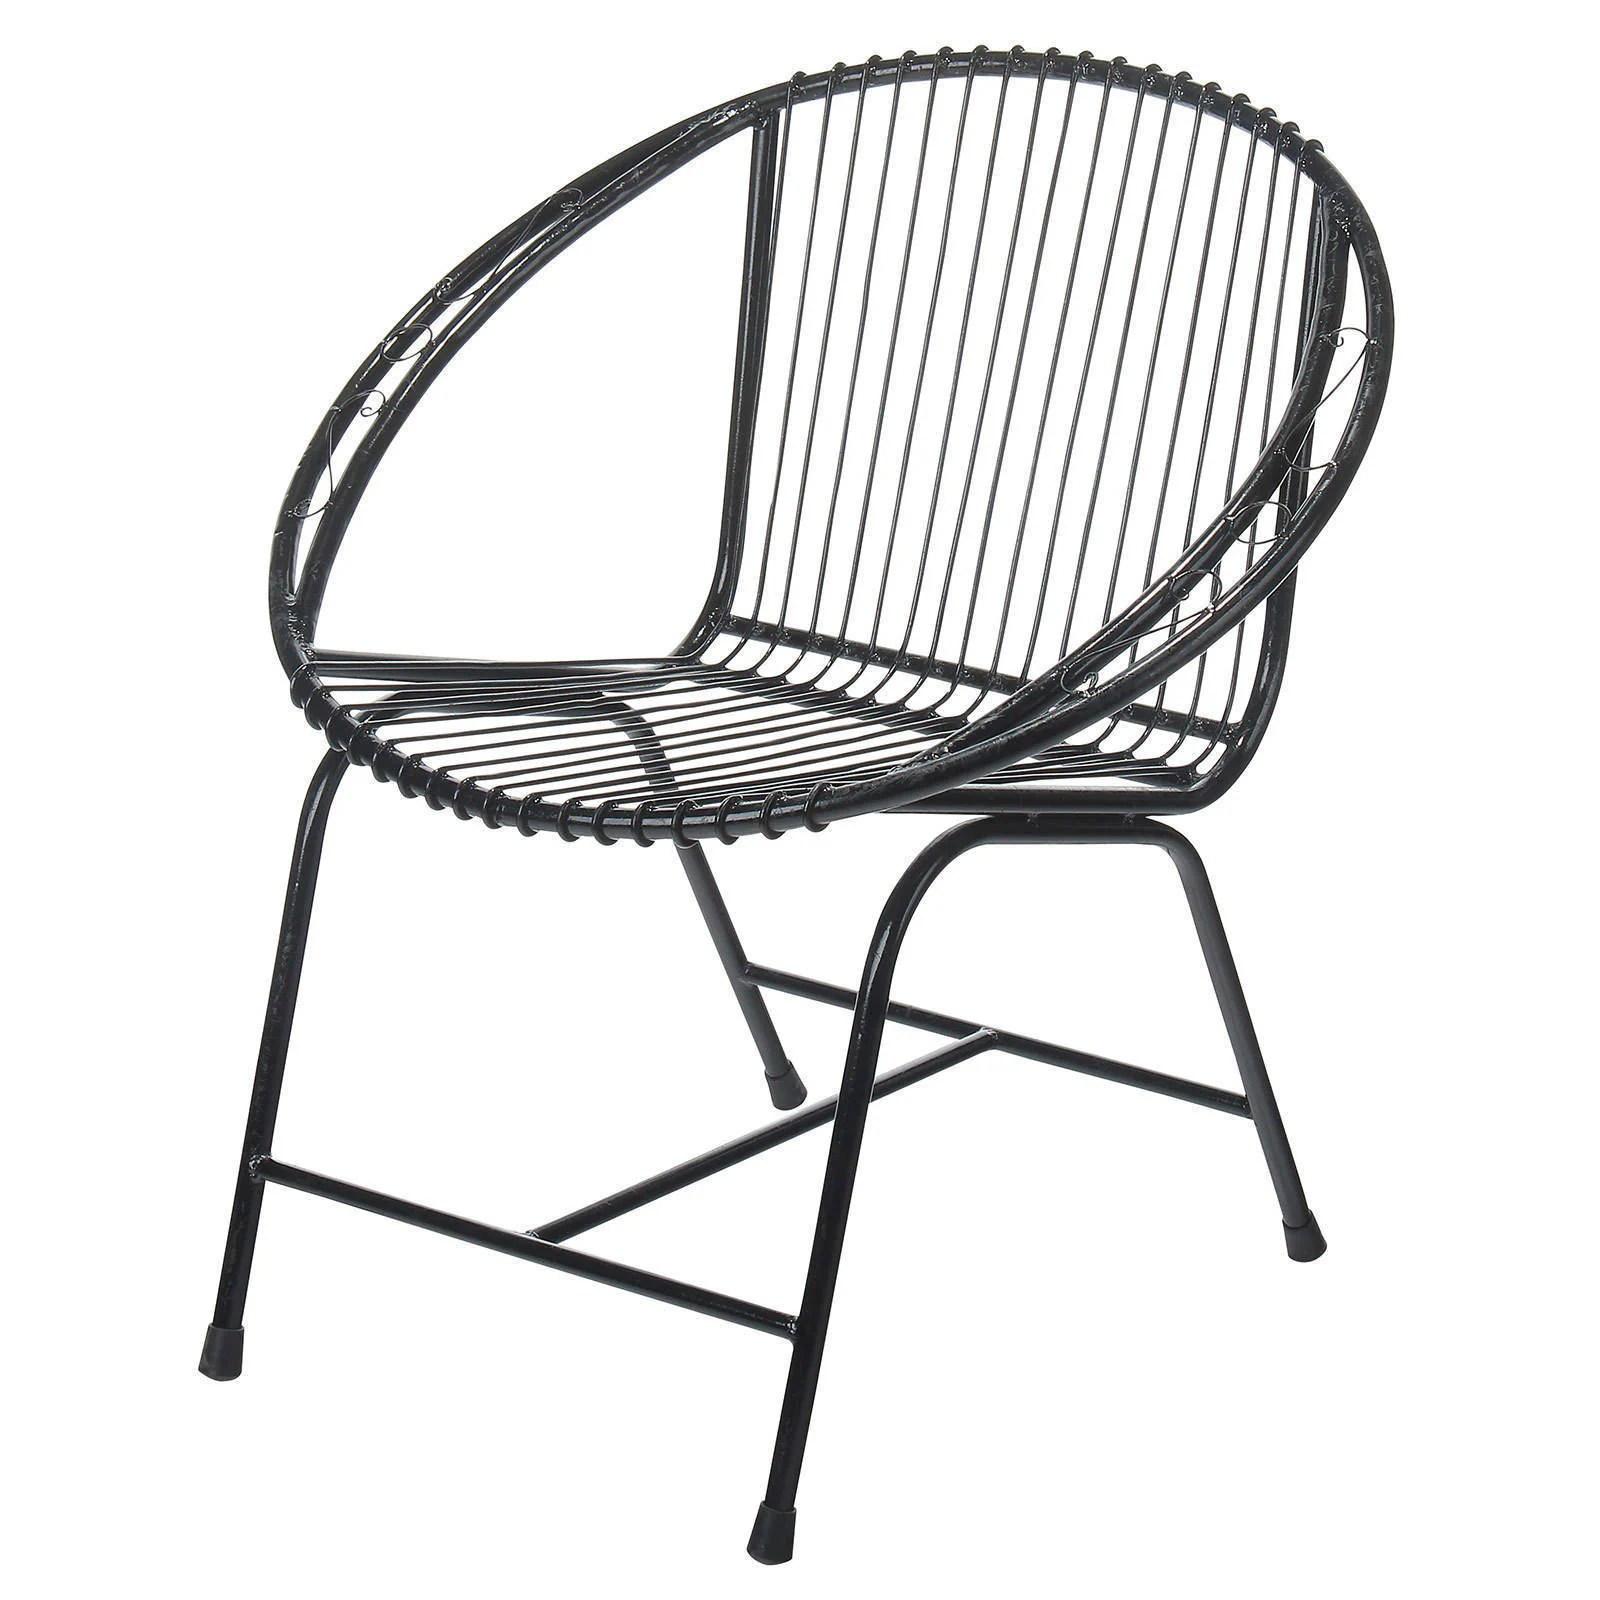 black wire chair cane barrel shop handmade terrace metal filigree indonesia